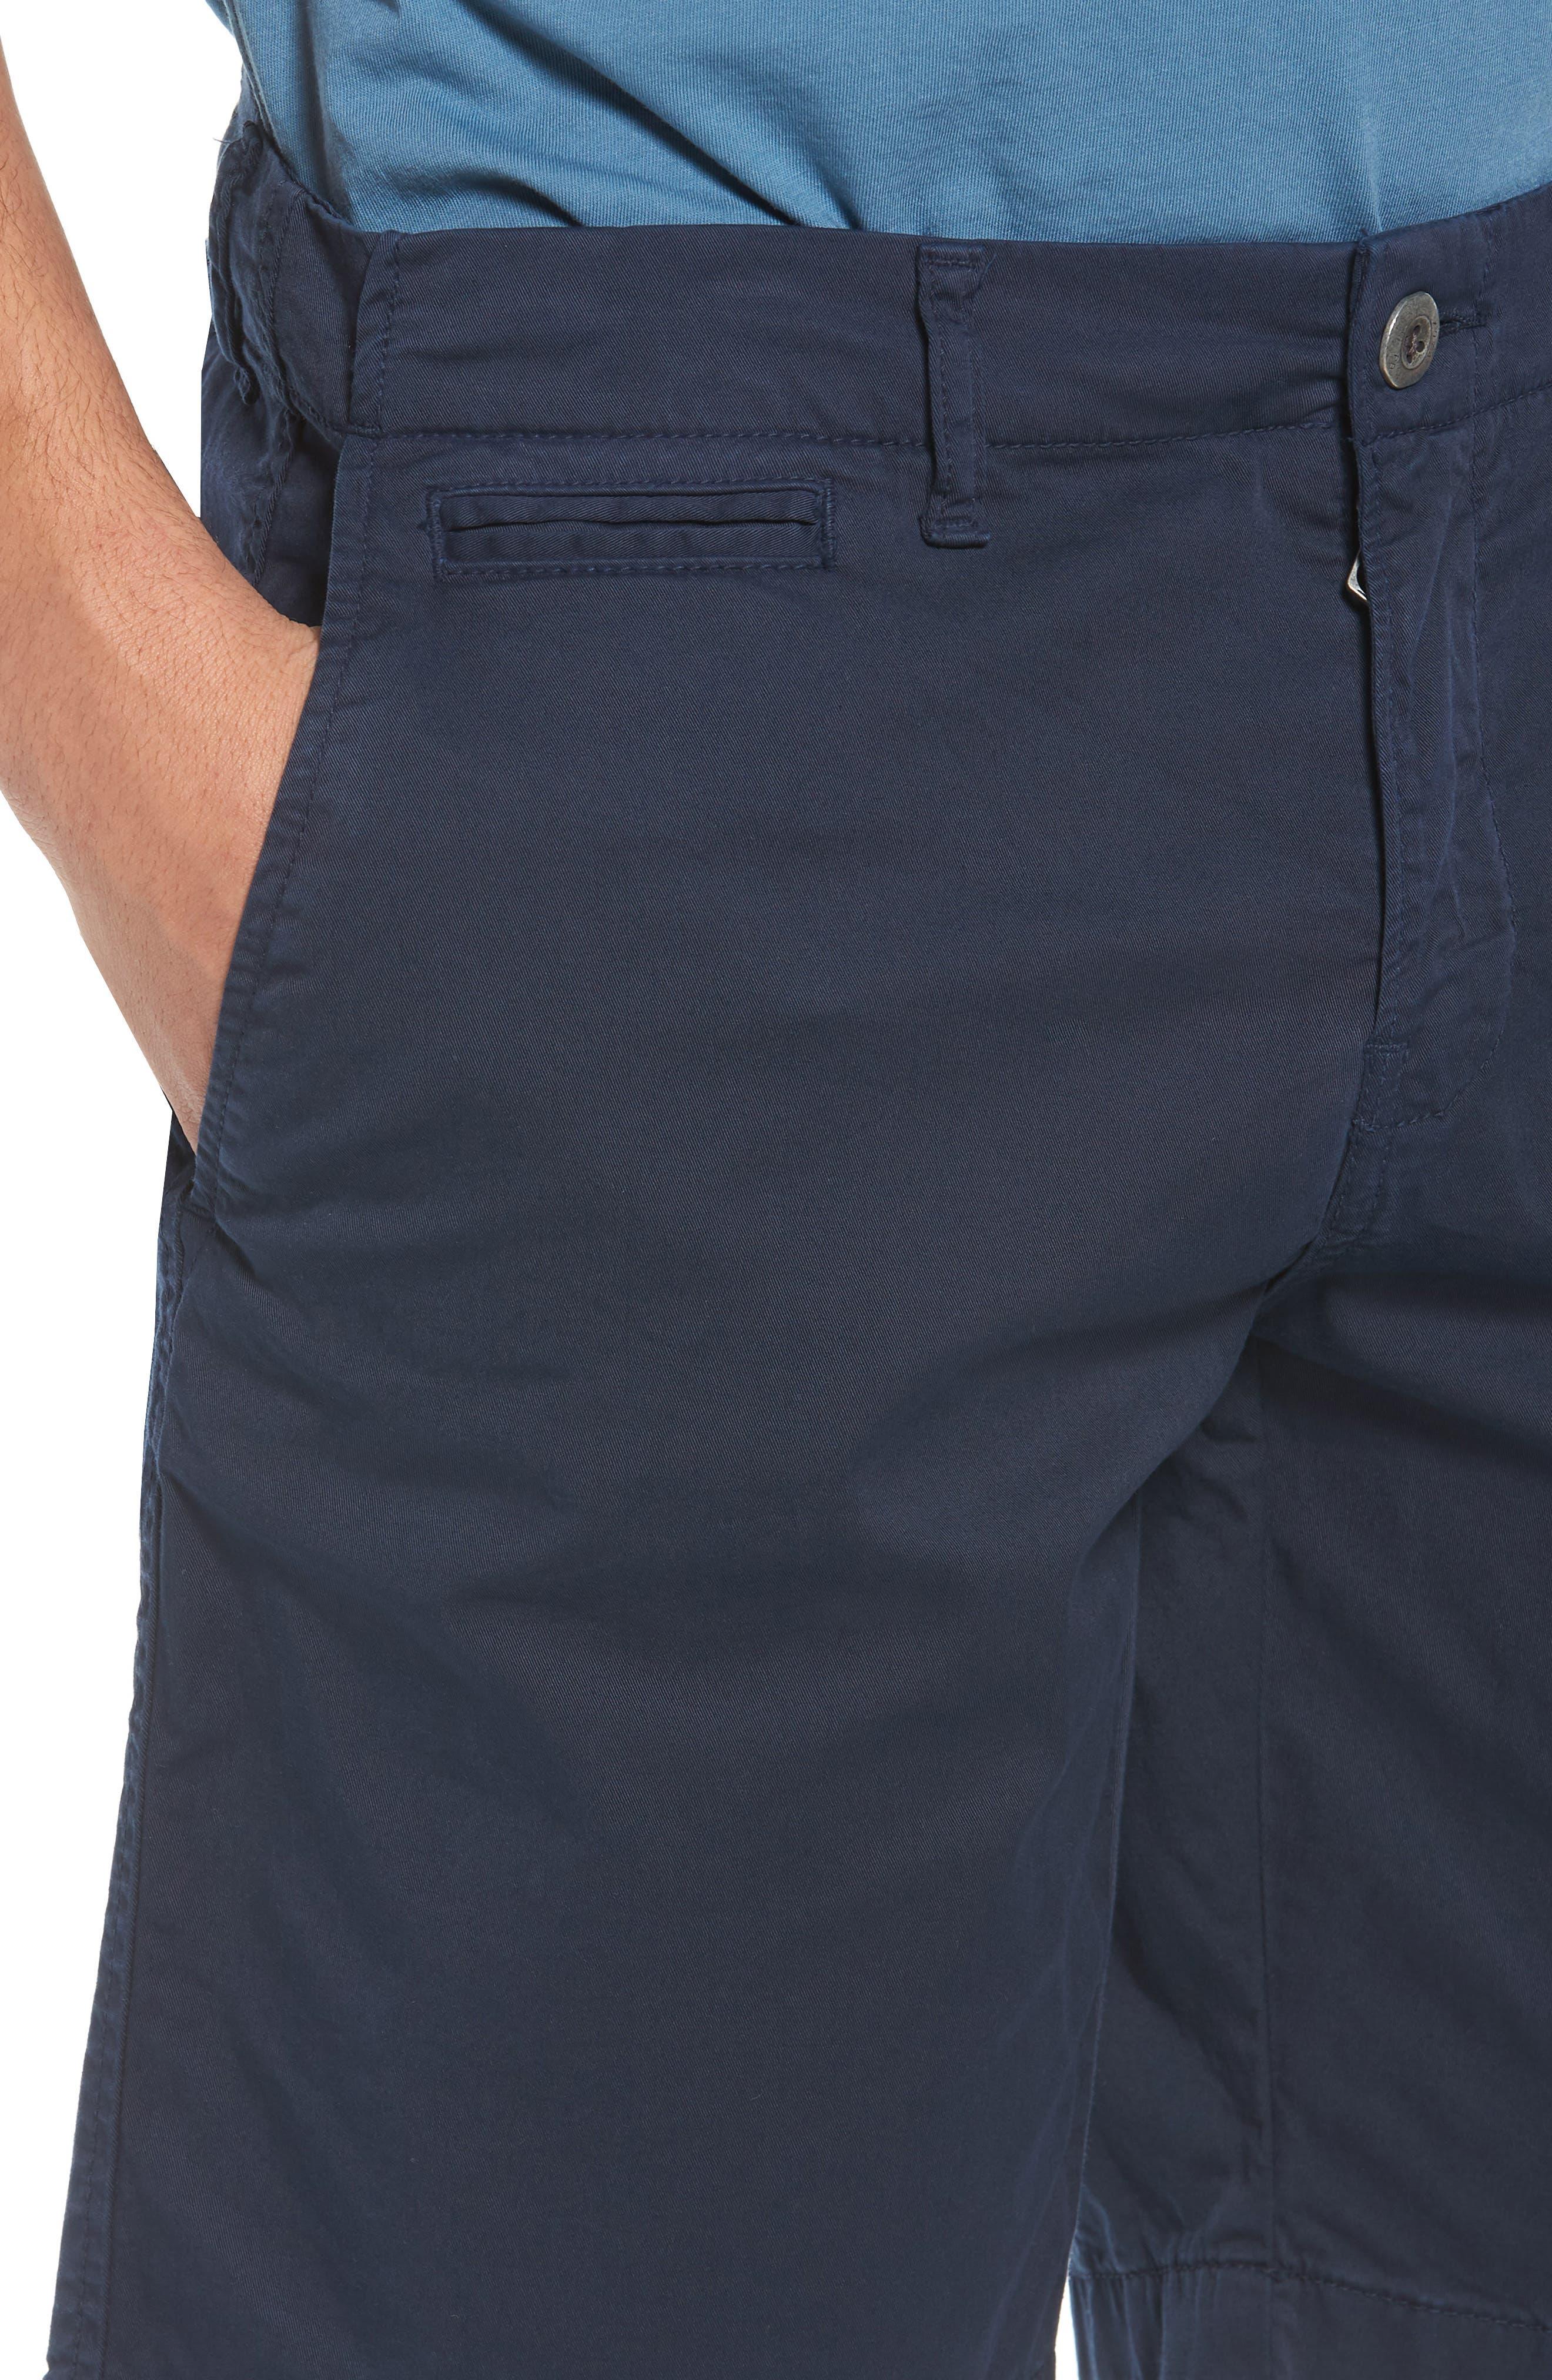 St. Barts Twill Shorts,                             Alternate thumbnail 45, color,